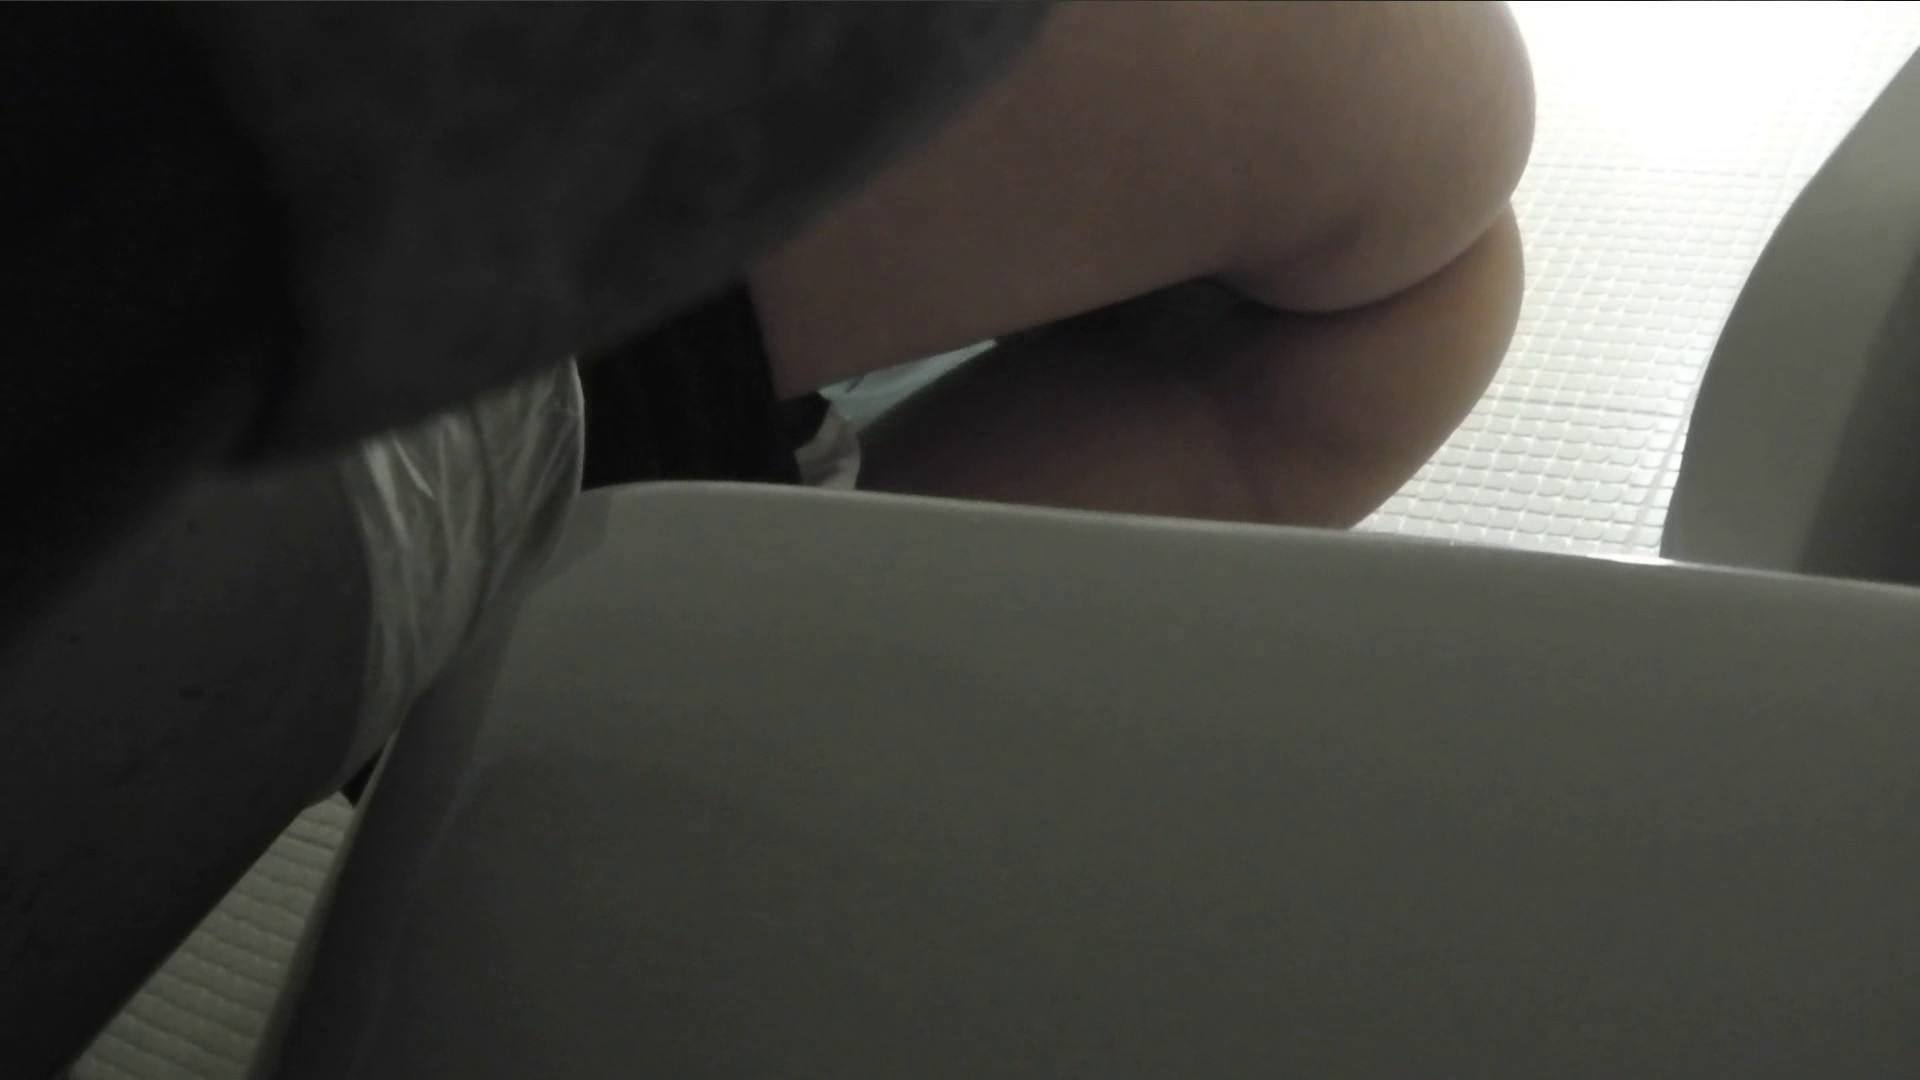 vol.02 着替えシーンもありマス OLの実態 覗きオメコ動画キャプチャ 52pic 44